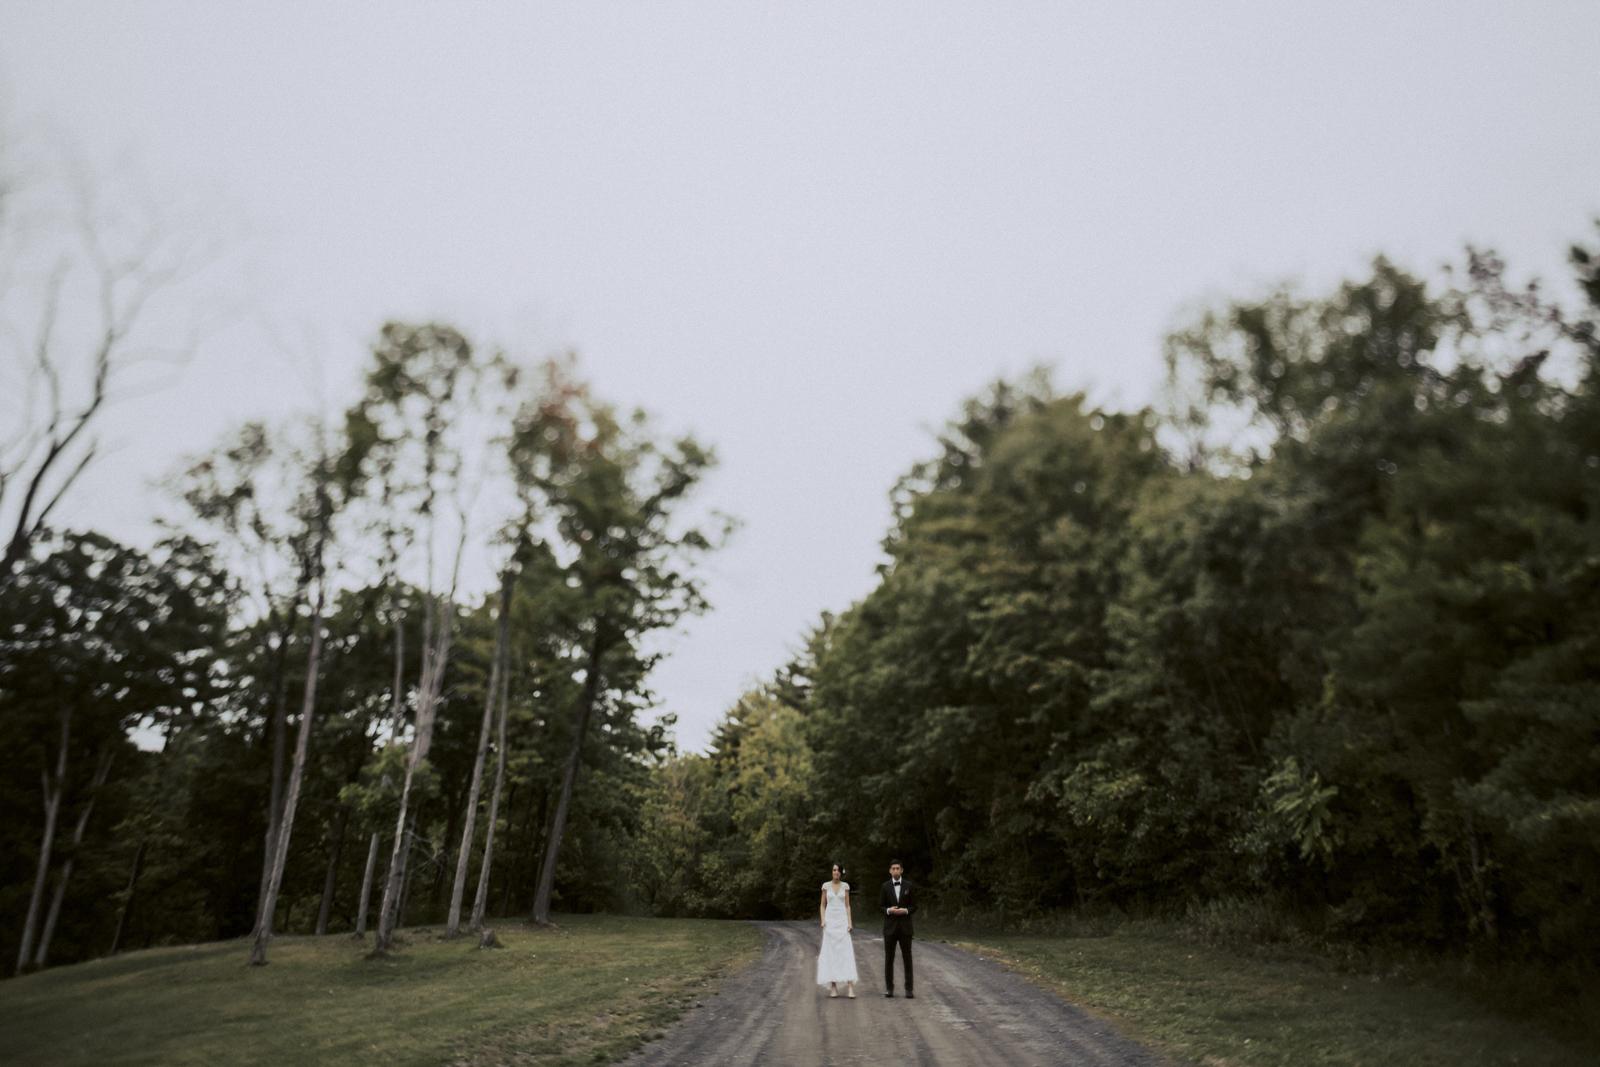 Jiwoo+Tara-Married-Blog-35.jpg